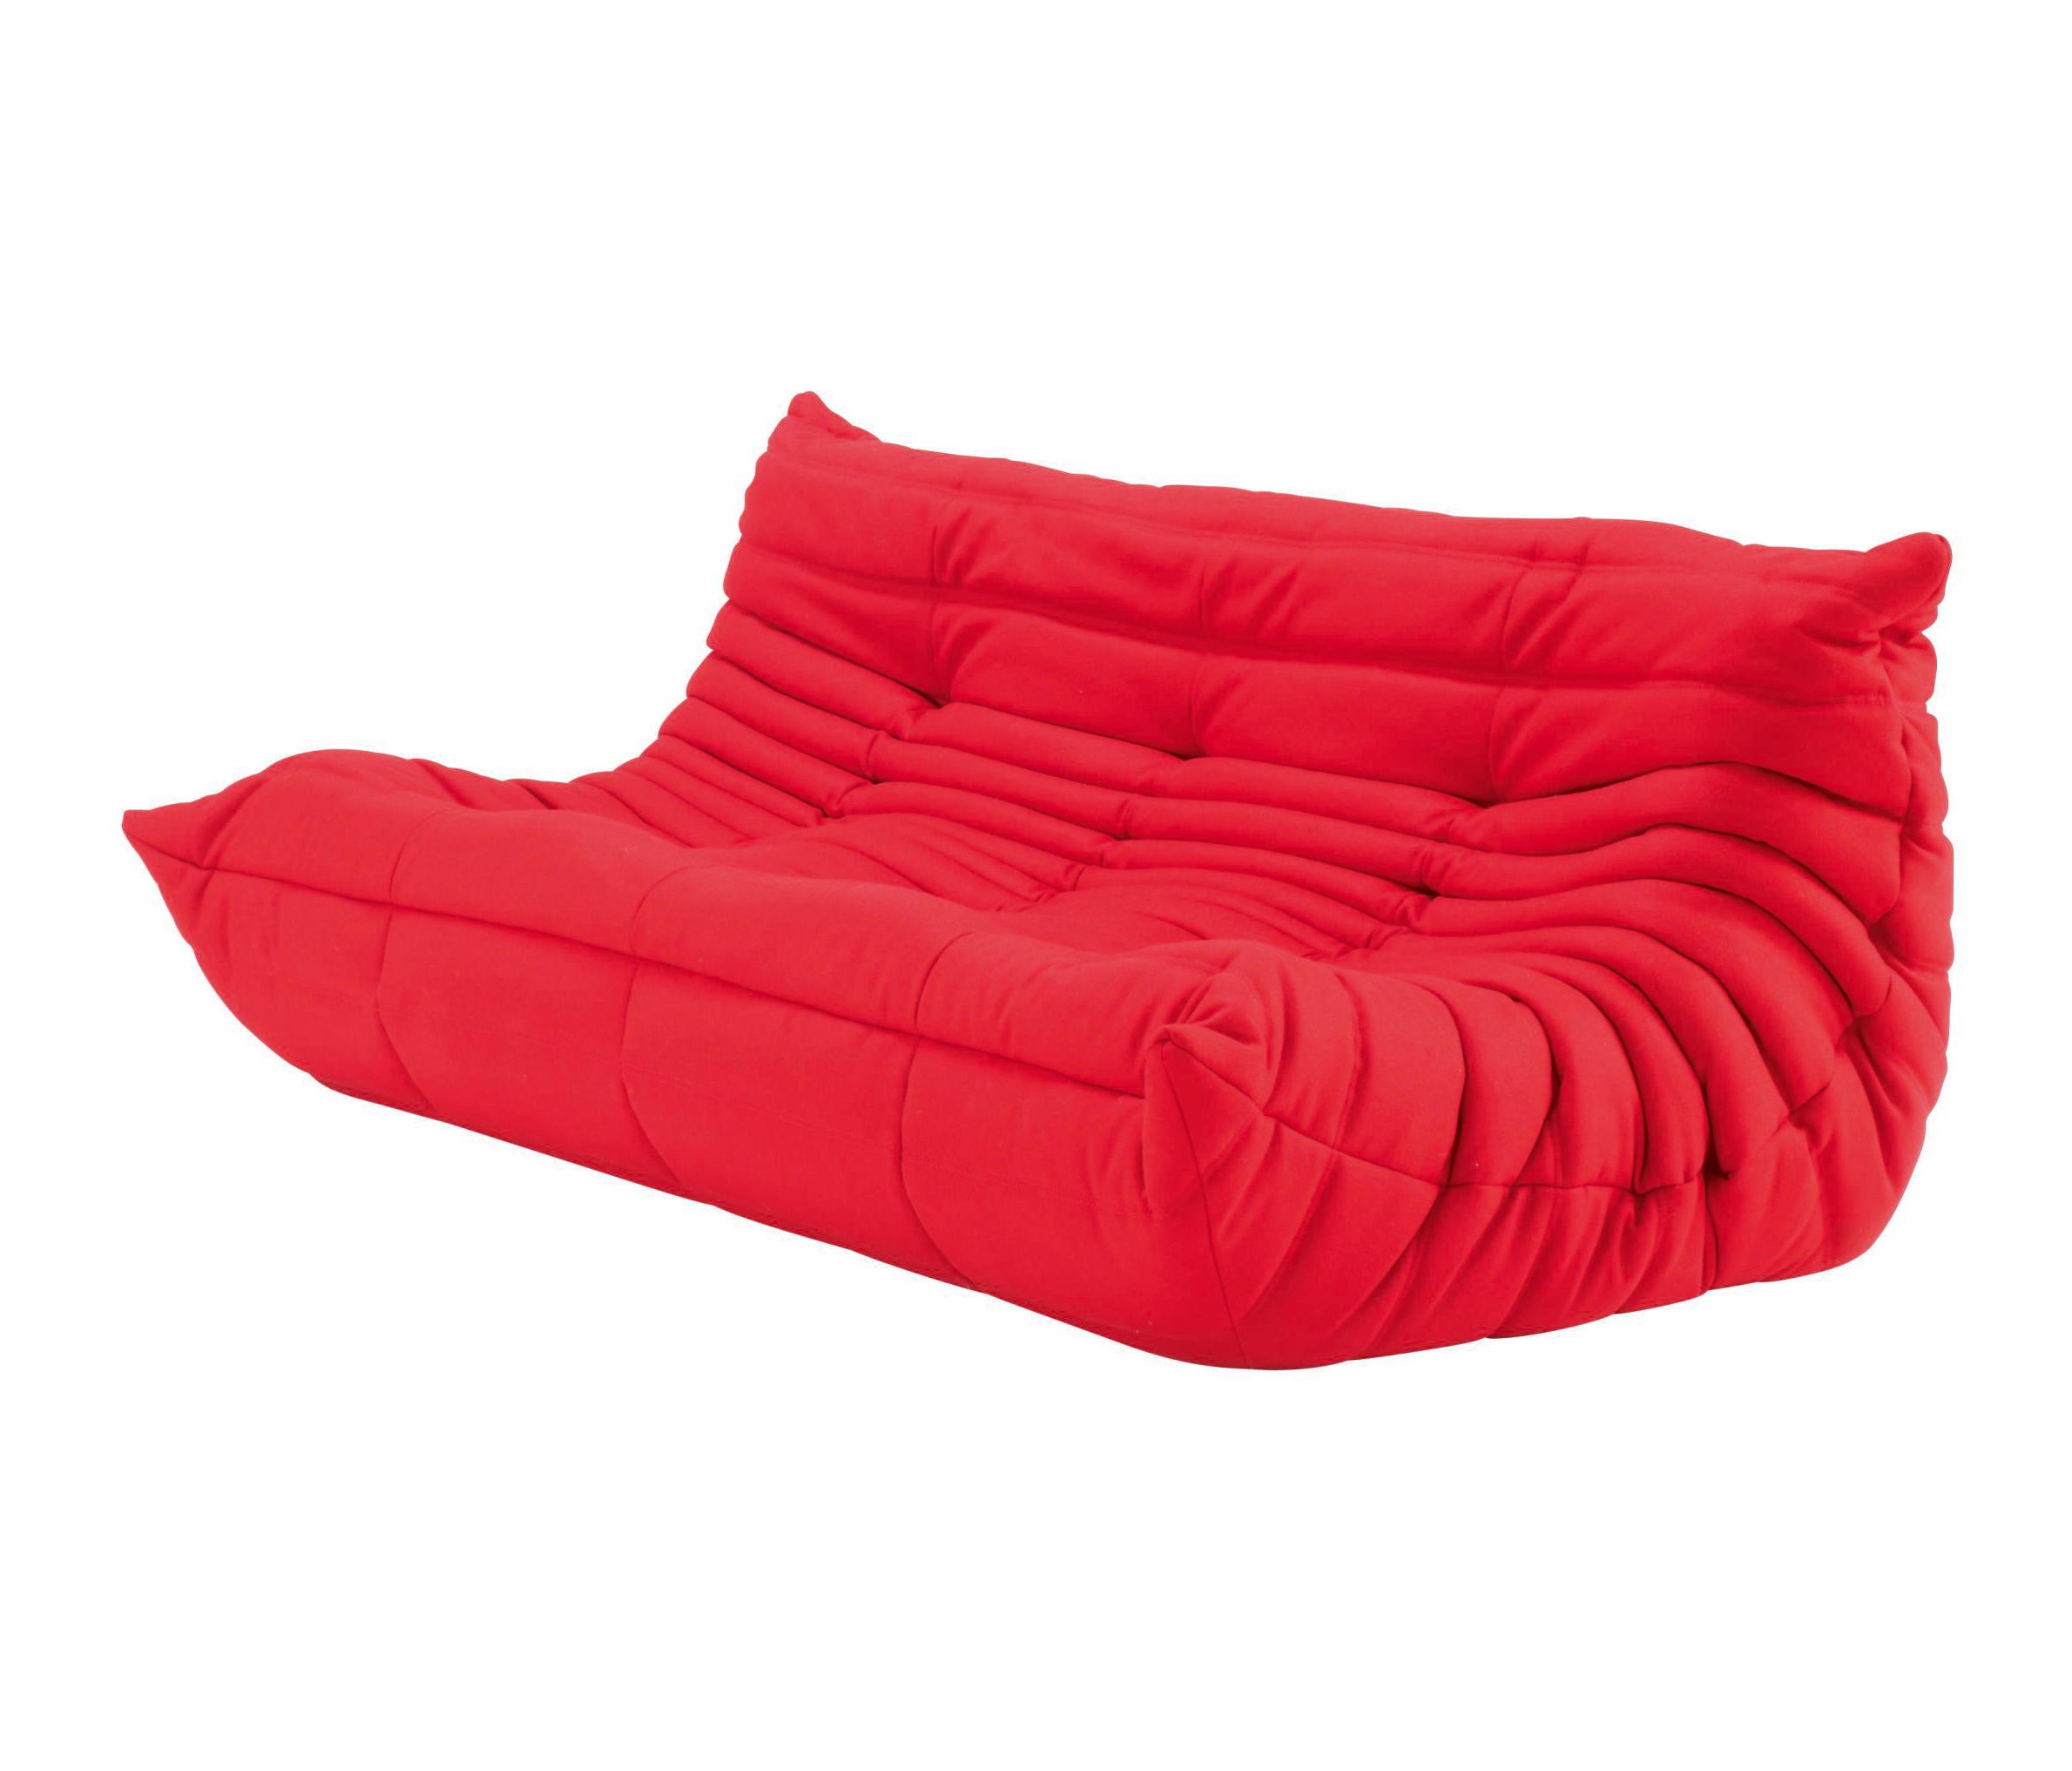 togo 3 sitzer ohne armlehne sofas von ligne roset architonic. Black Bedroom Furniture Sets. Home Design Ideas